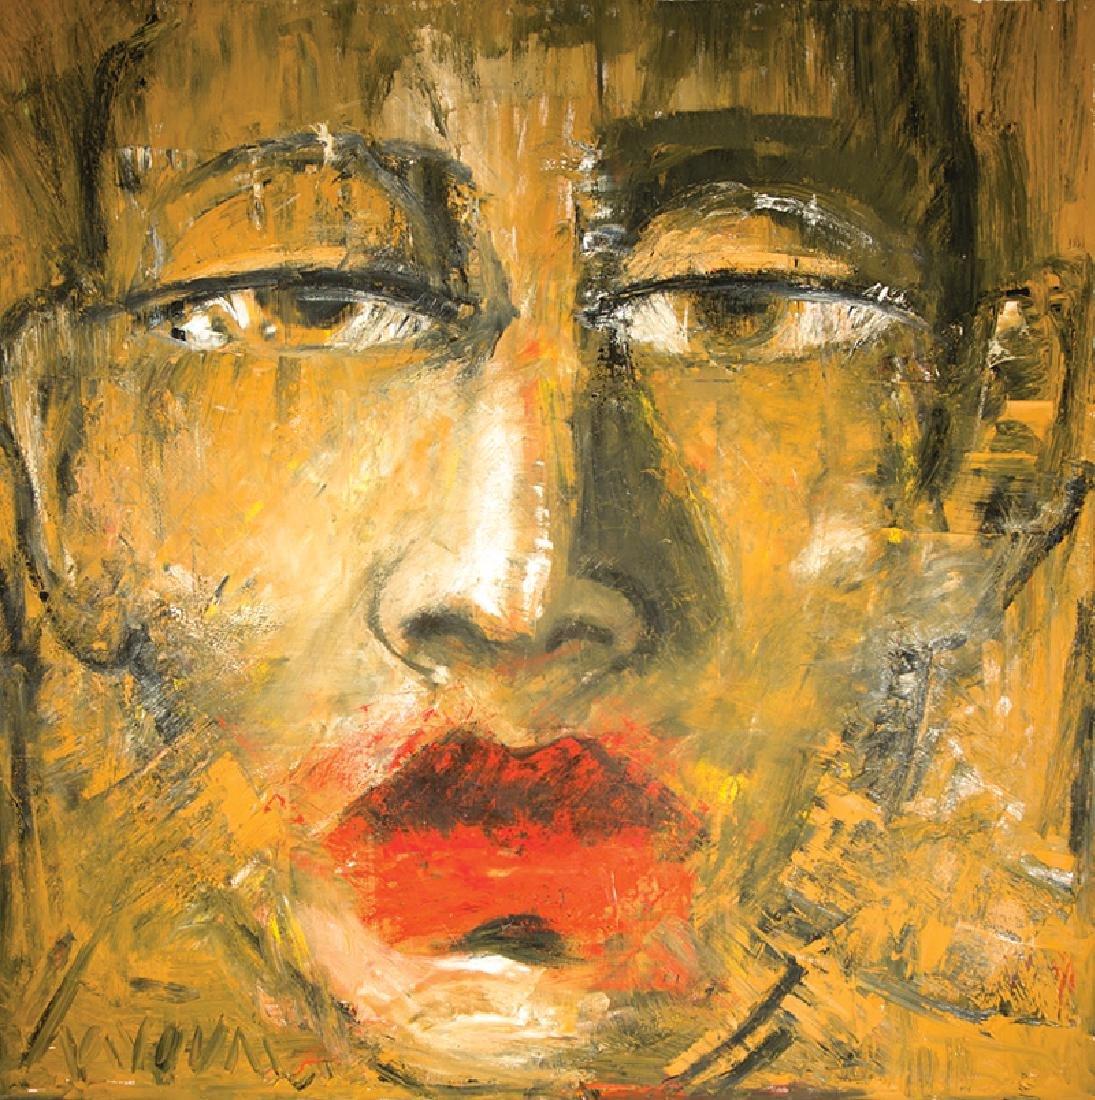 David Harouni (Iranian/New Orleans, b. 1962)